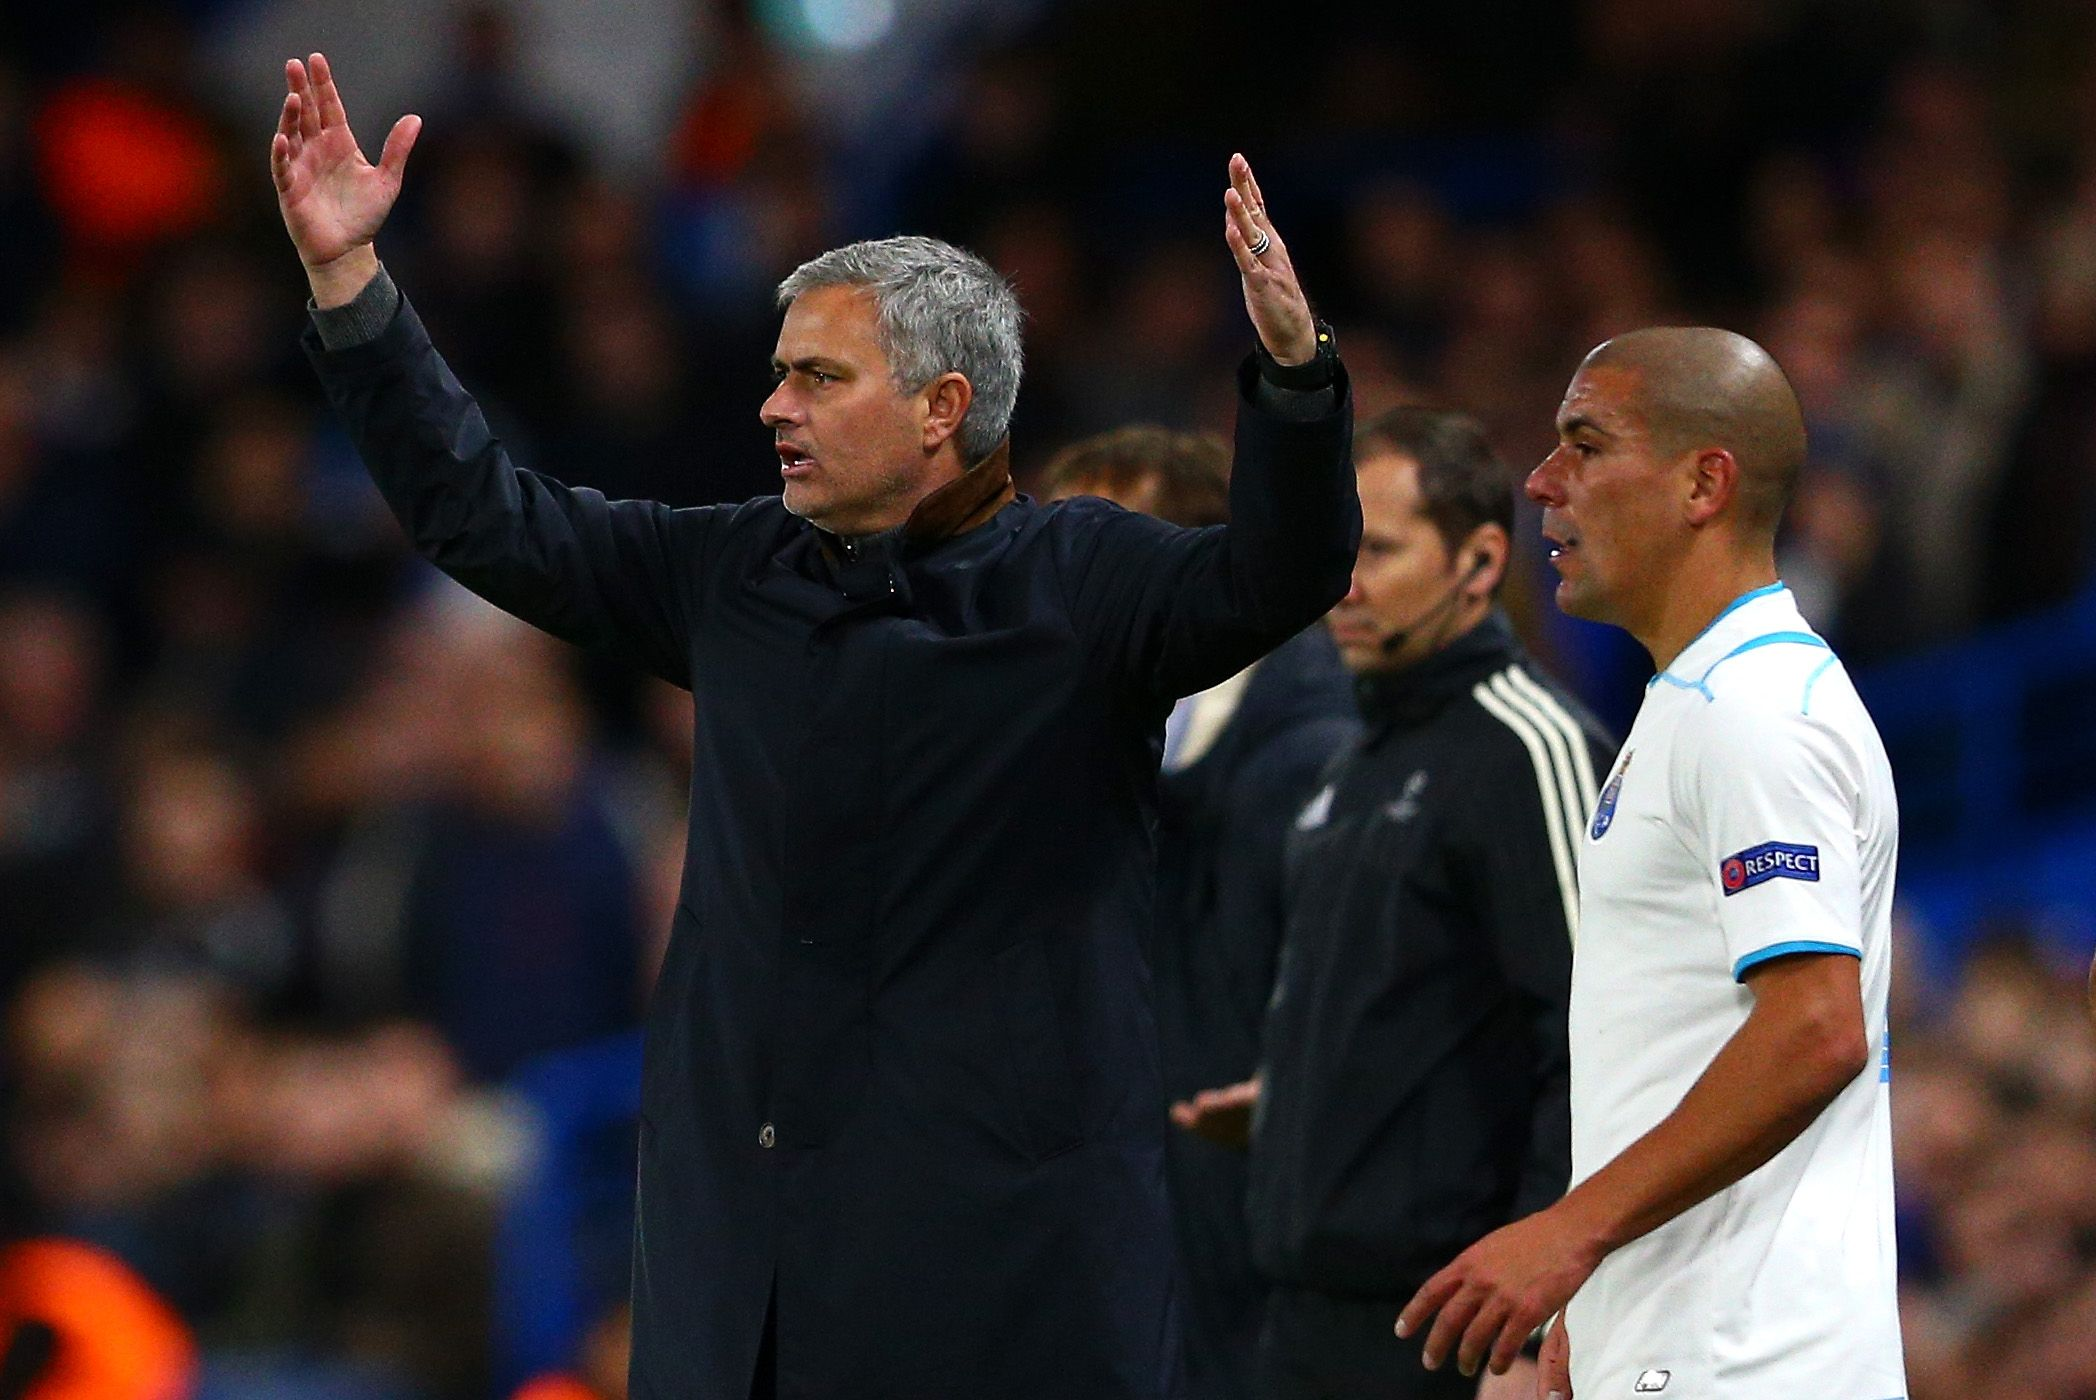 Jose Mourinho: Manchester United Target Receives Surprise Job Offer